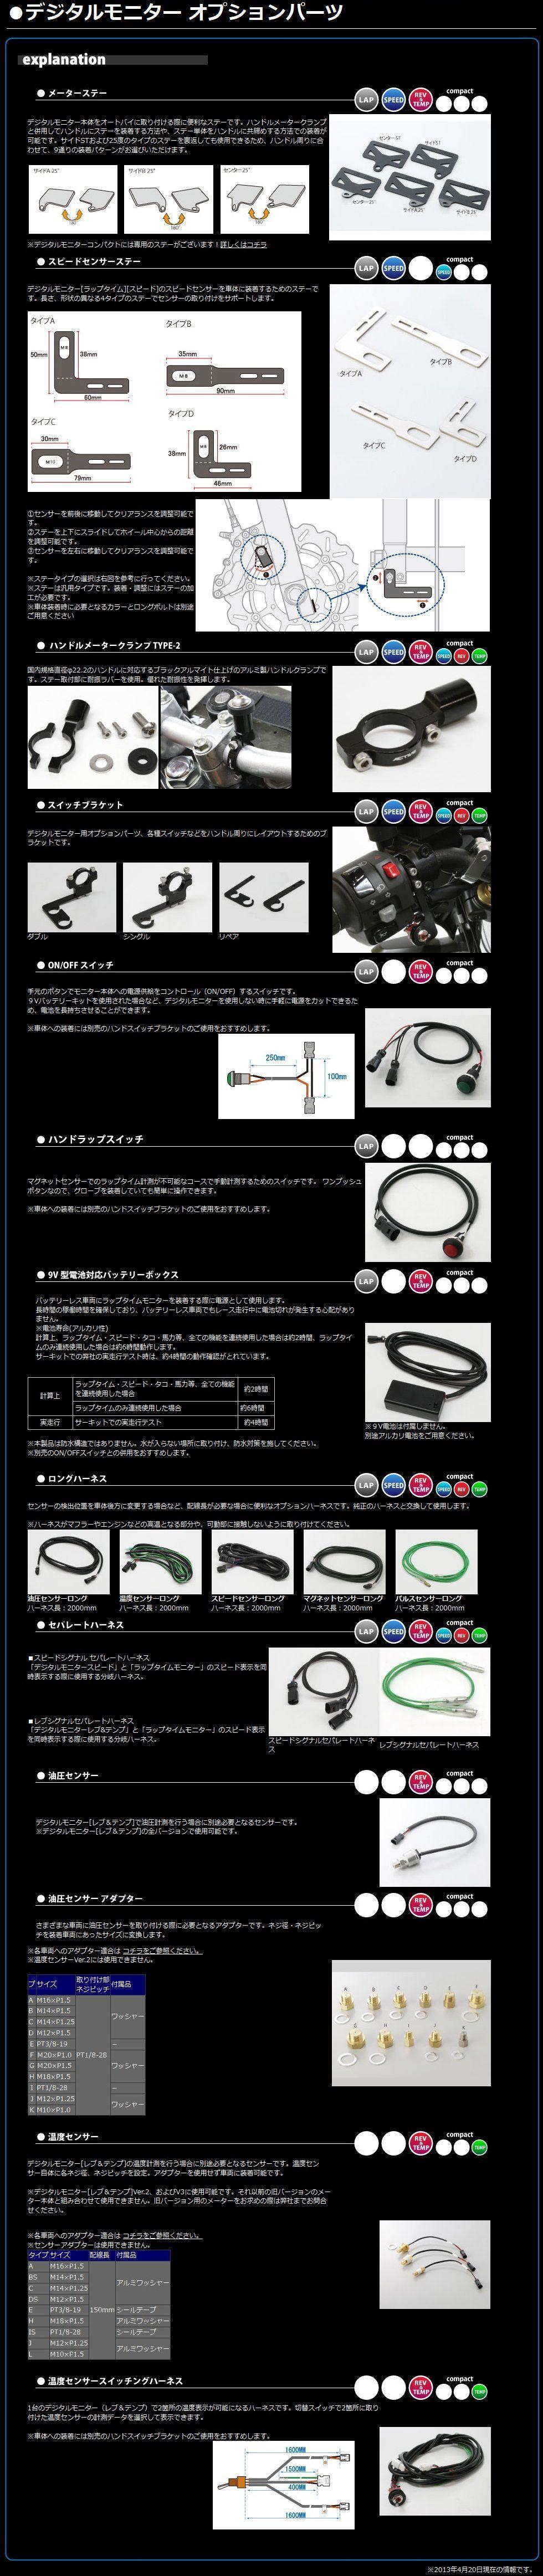 【ACTIVE】數位儀錶用速度感知器束線 (0.8m) (維修替換品) [速度/計時] - 「Webike-摩托百貨」